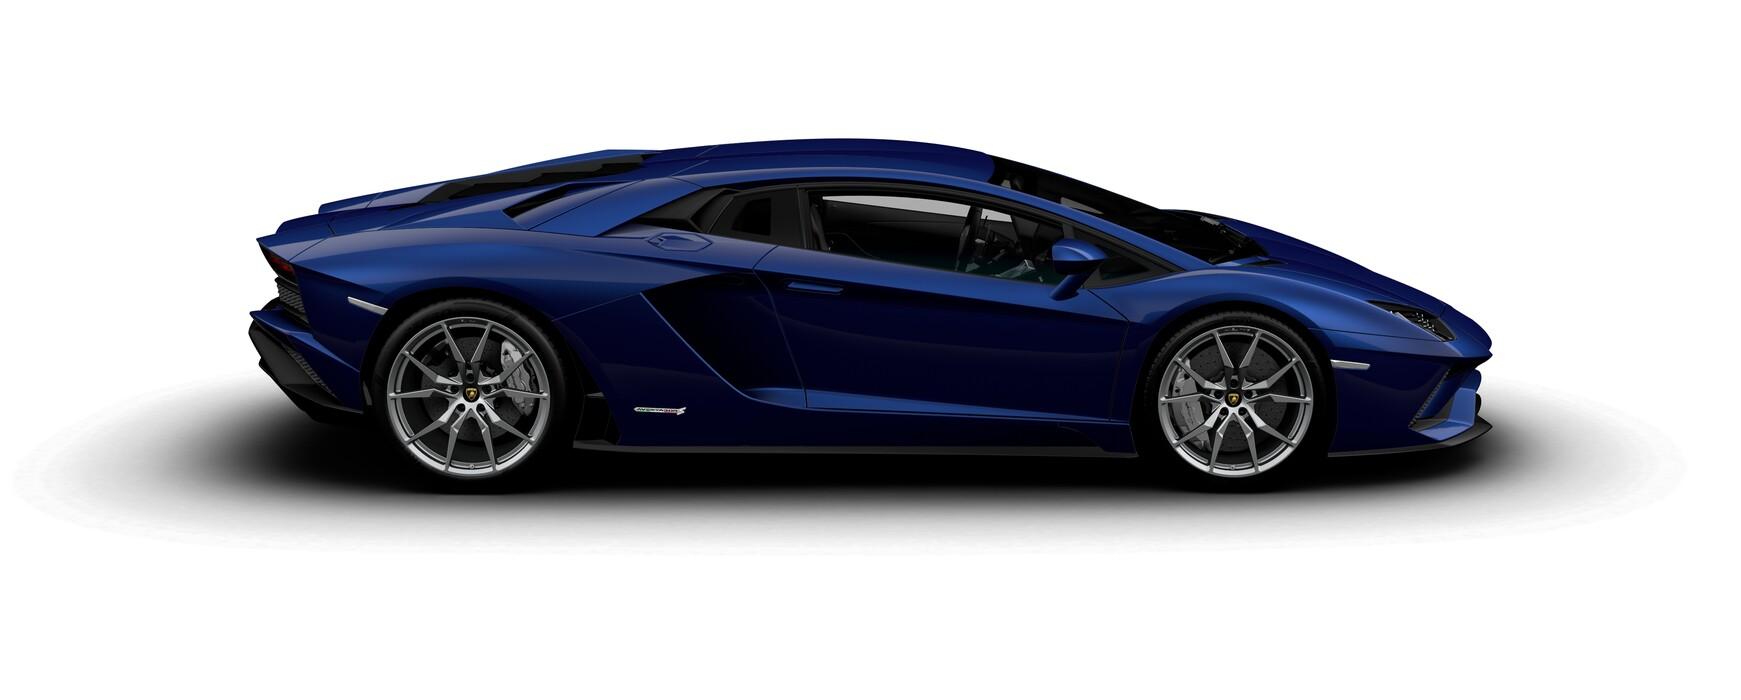 Lamborghini Aventador S Coupe metallic Blu Sideris side view